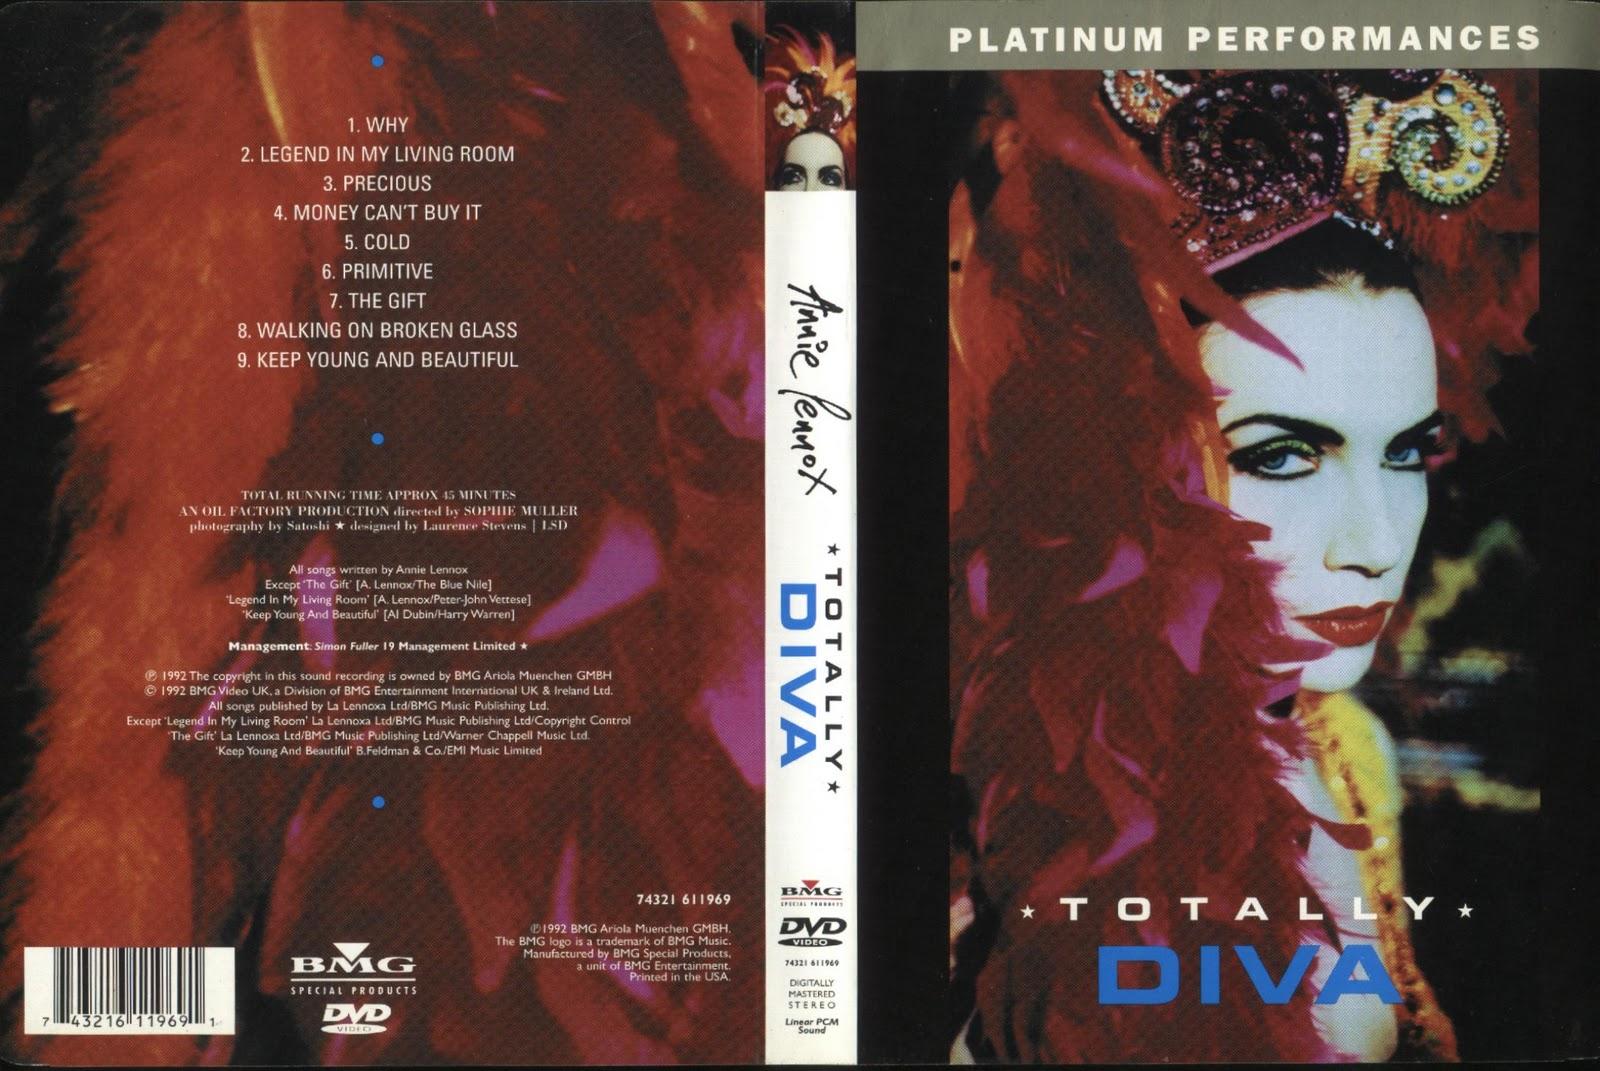 http://1.bp.blogspot.com/_dpj8cXZxGgs/TMNBPW2rNEI/AAAAAAAAAJg/aAsolacXUro/s1600/Annie+Lennox+Totally+Diva.JPG